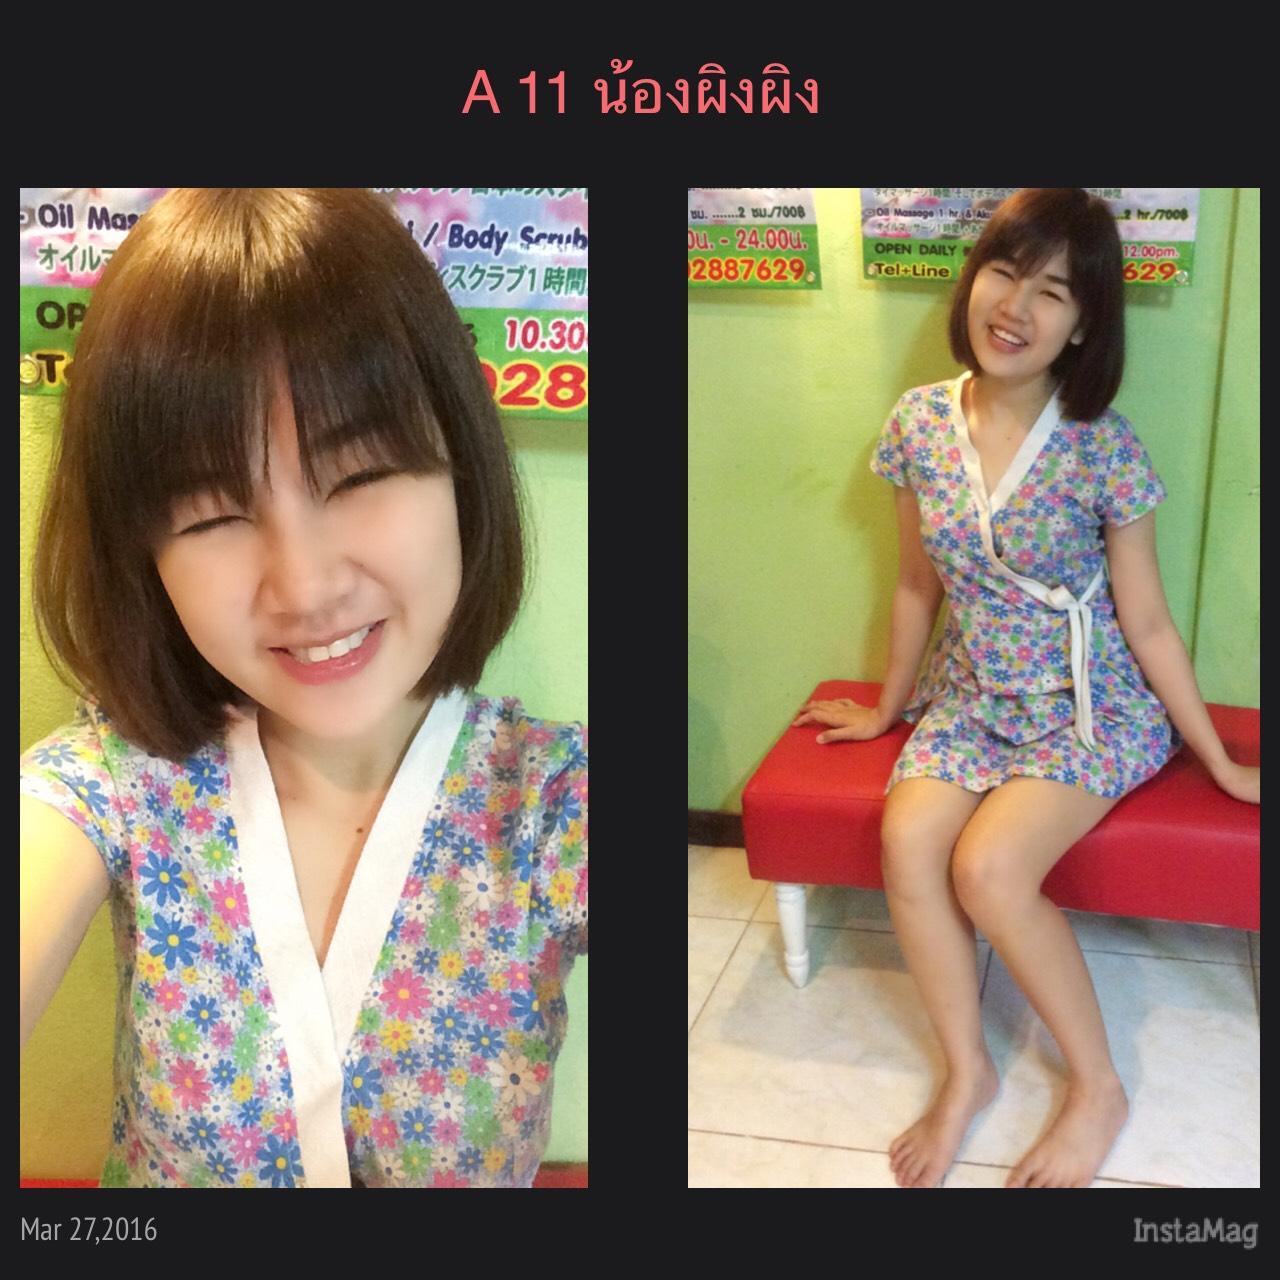 thai genital massage thai brothels sydney